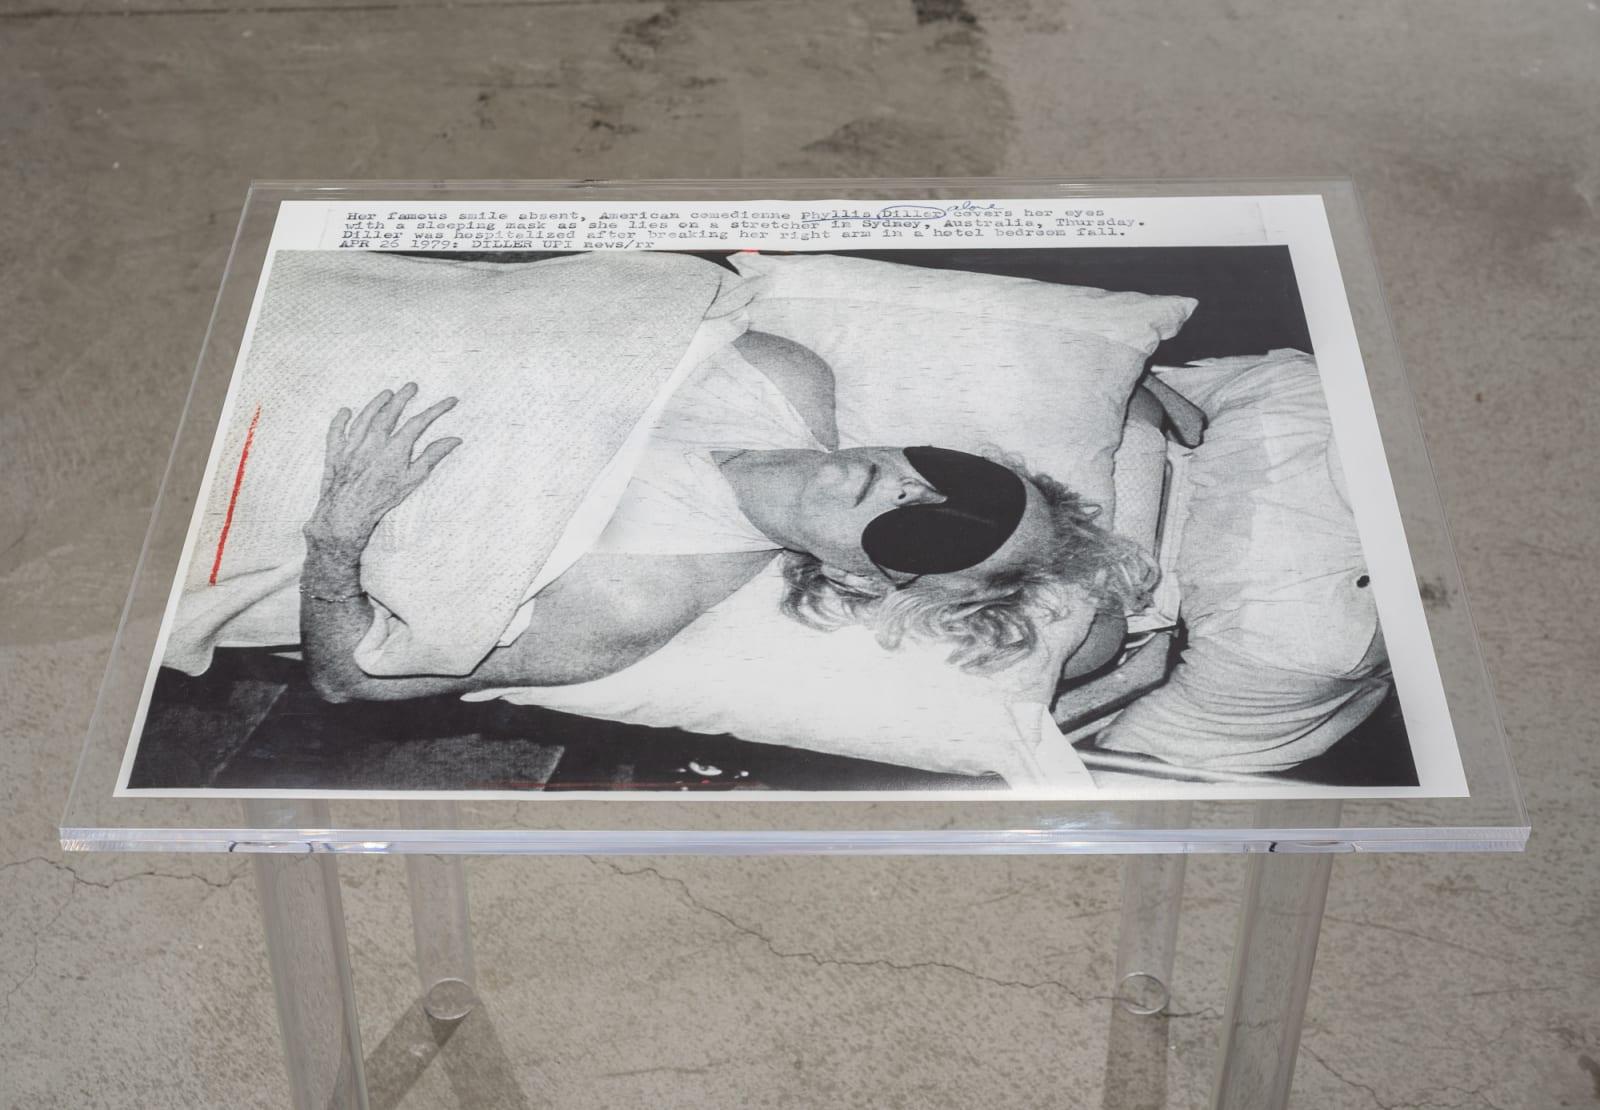 Lindsey White Fallen Comedienne, 2021 archival pigment print, plexiglass 32 x 26 x 32 inches unique